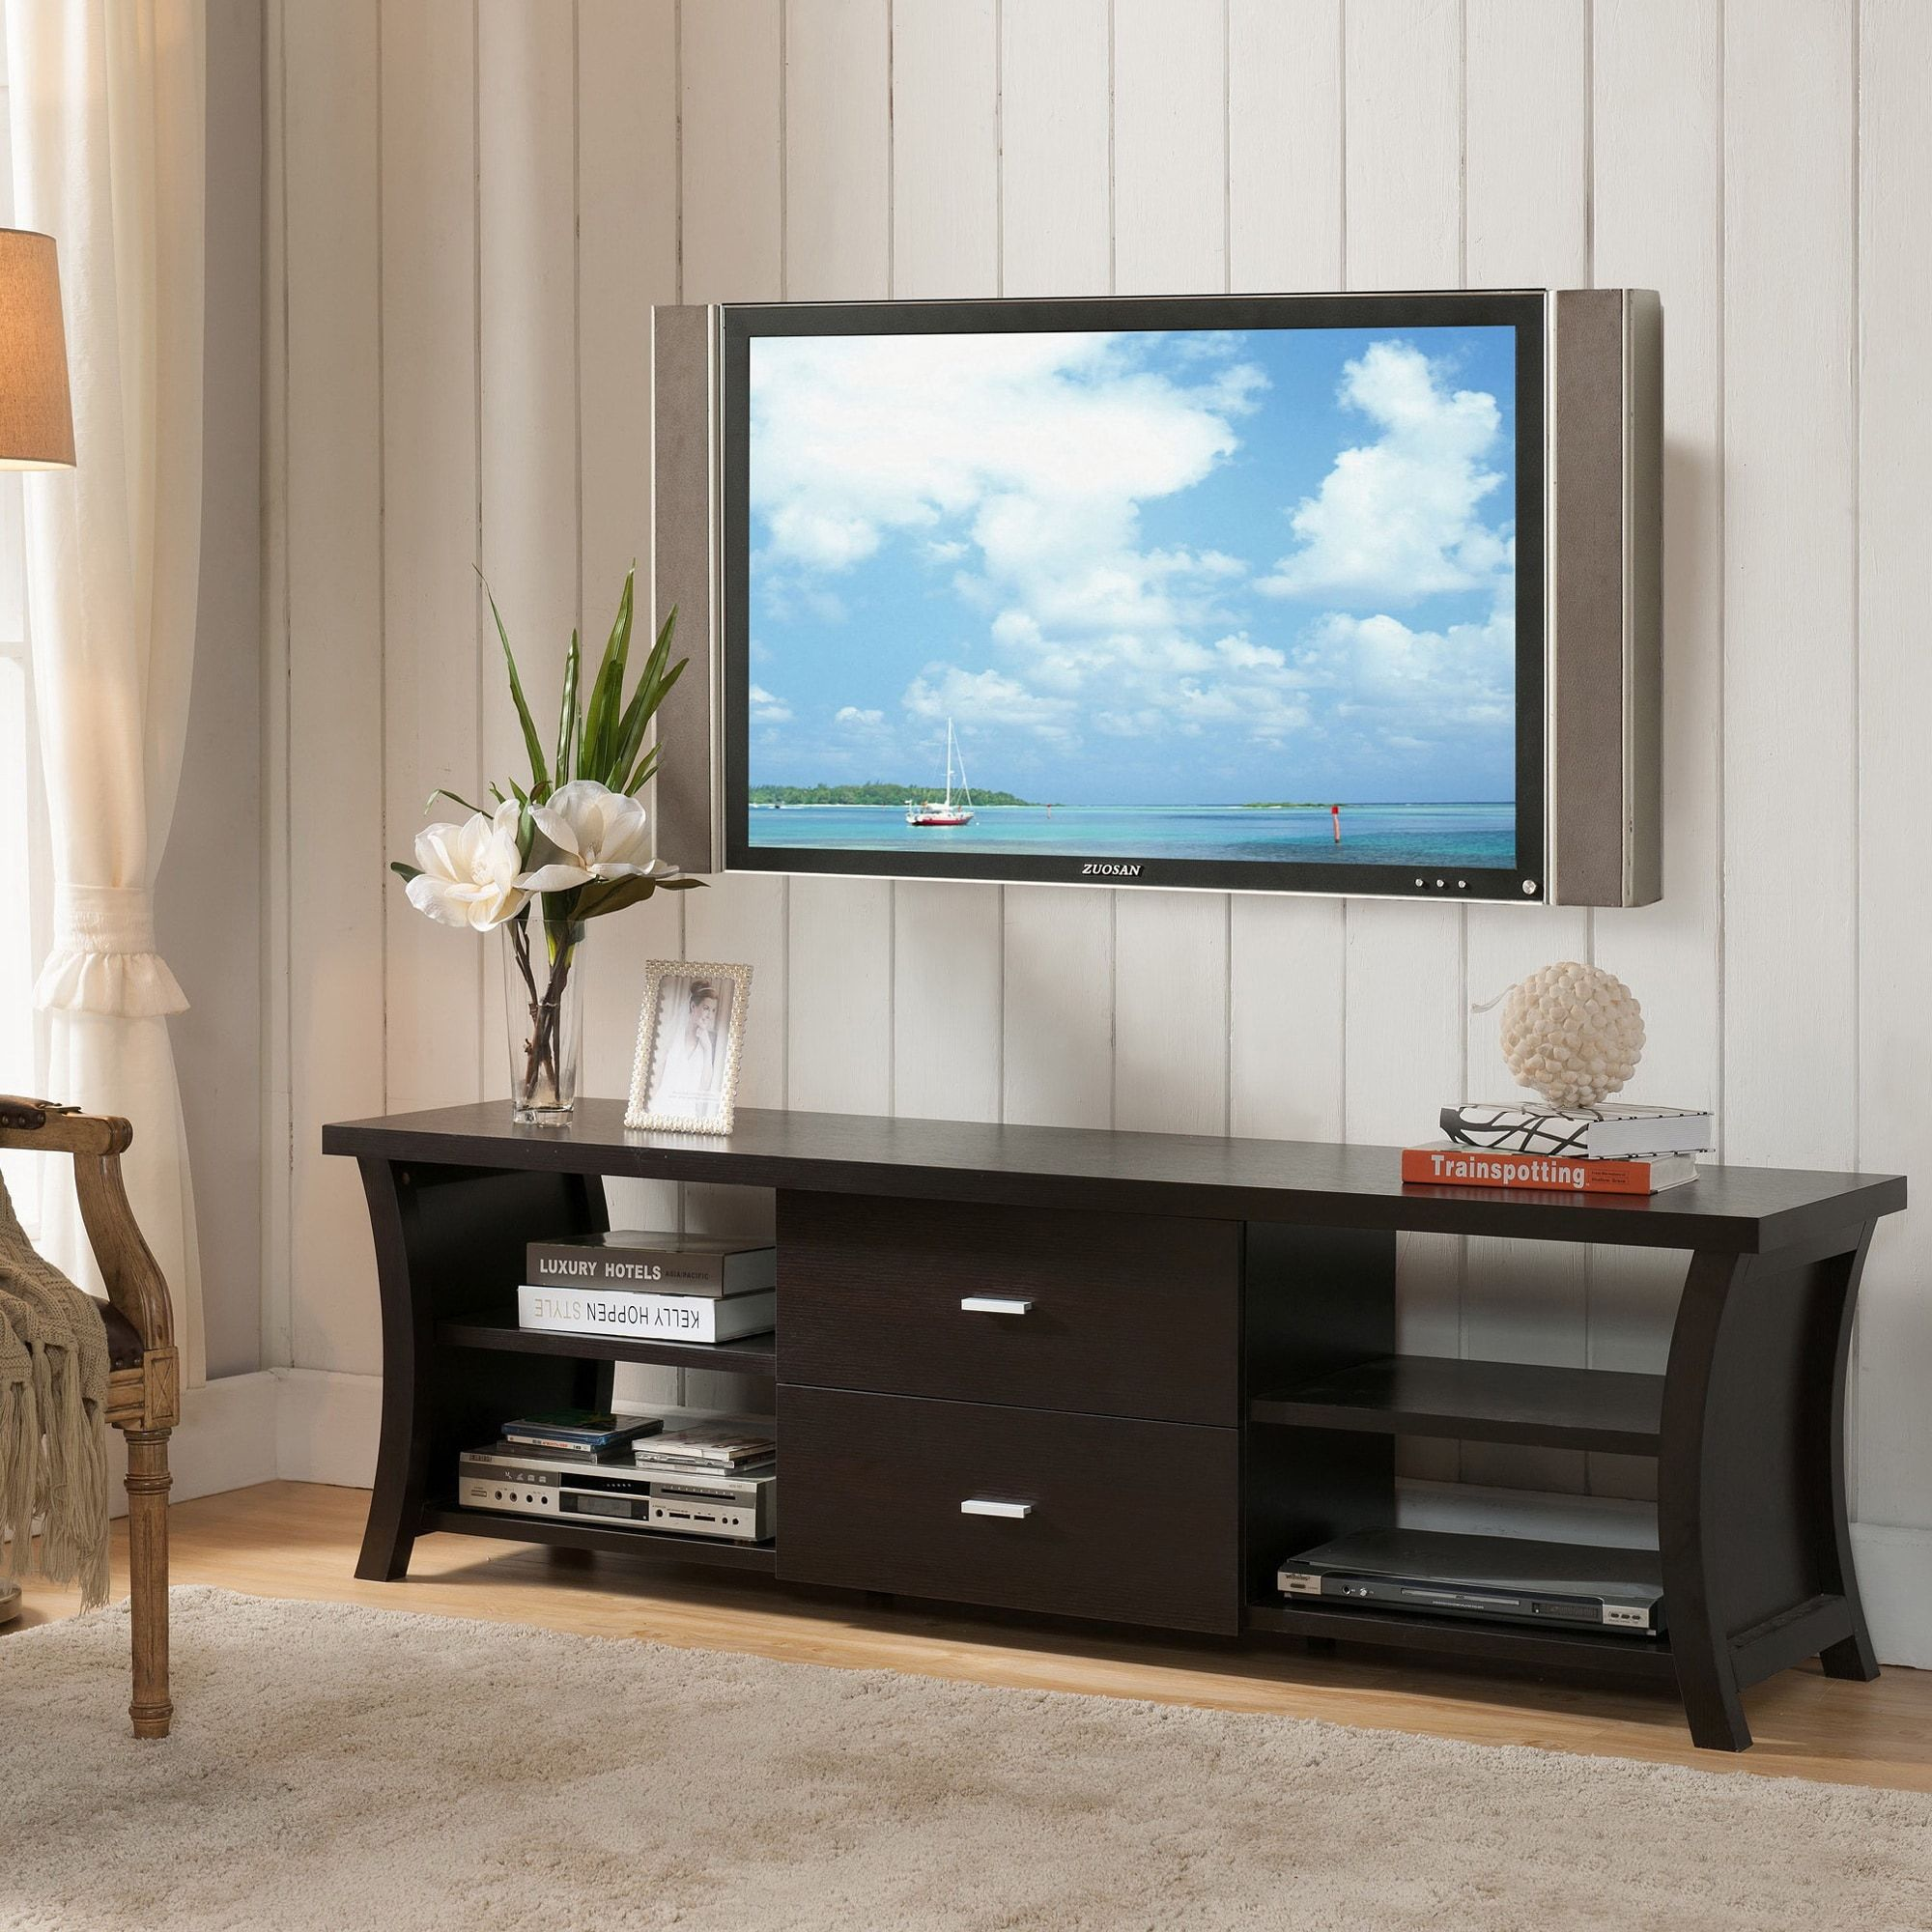 modern 2 drawer tv stand with open shelving 60 inch black rh pinterest com